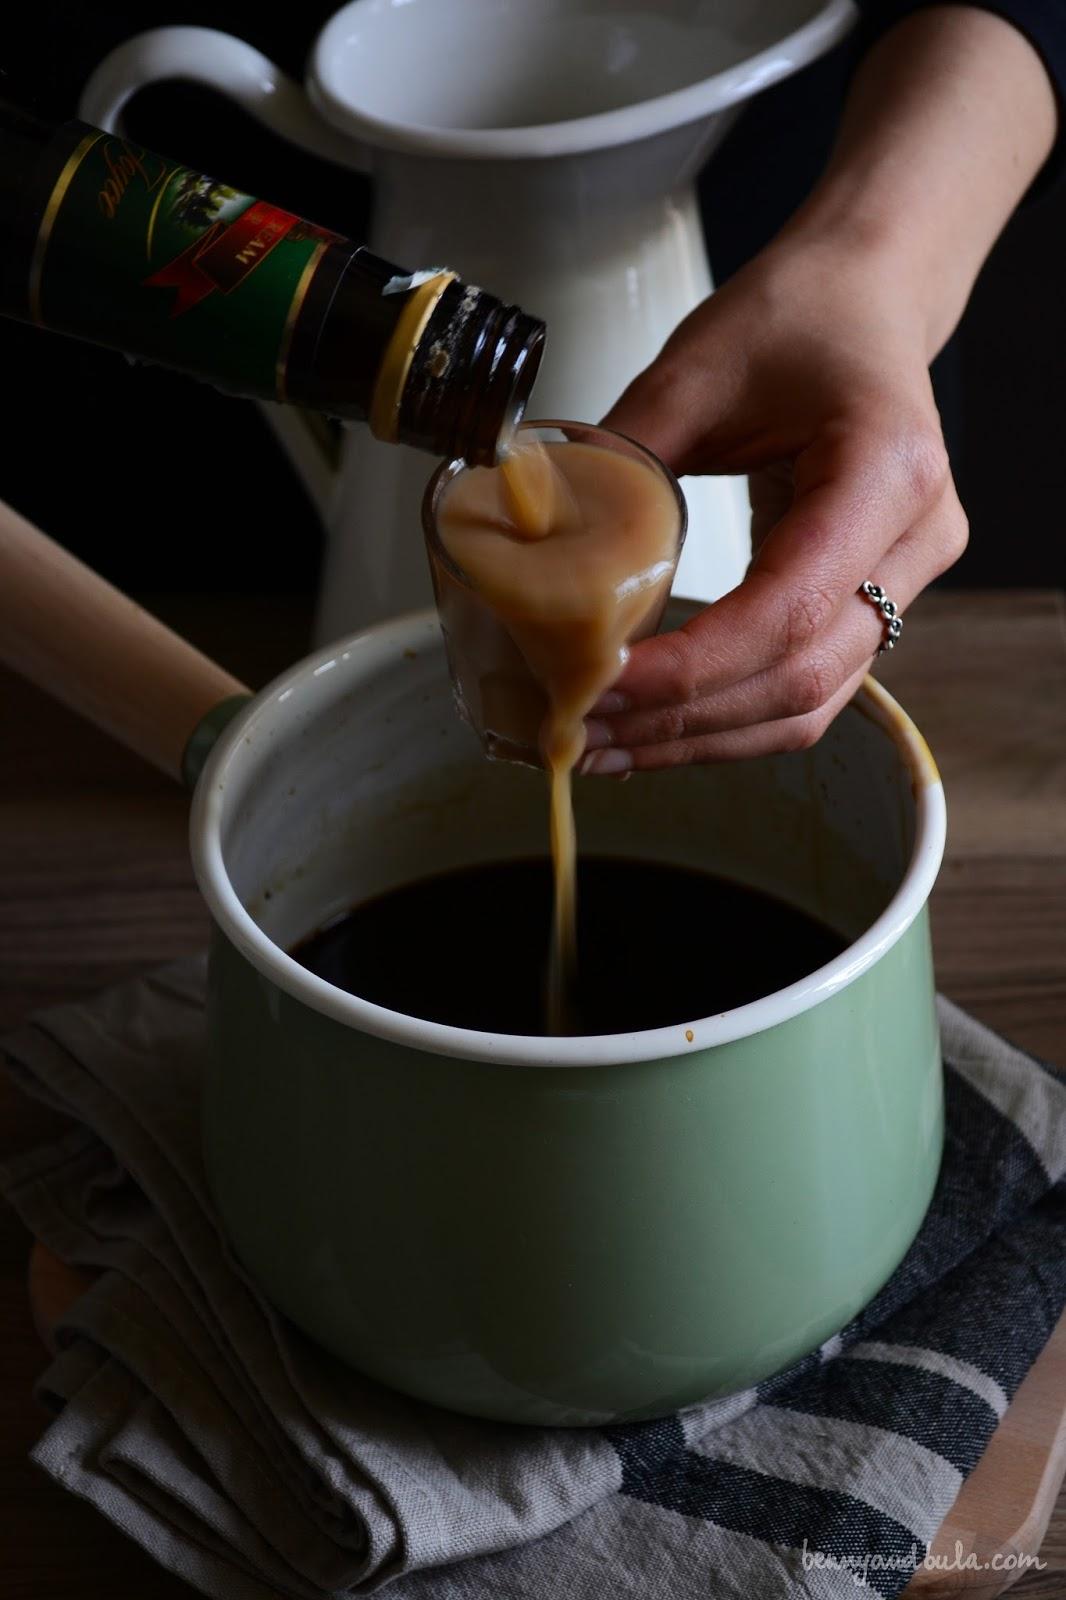 granita al caffè senza gelatiera/ mocha coffee granita